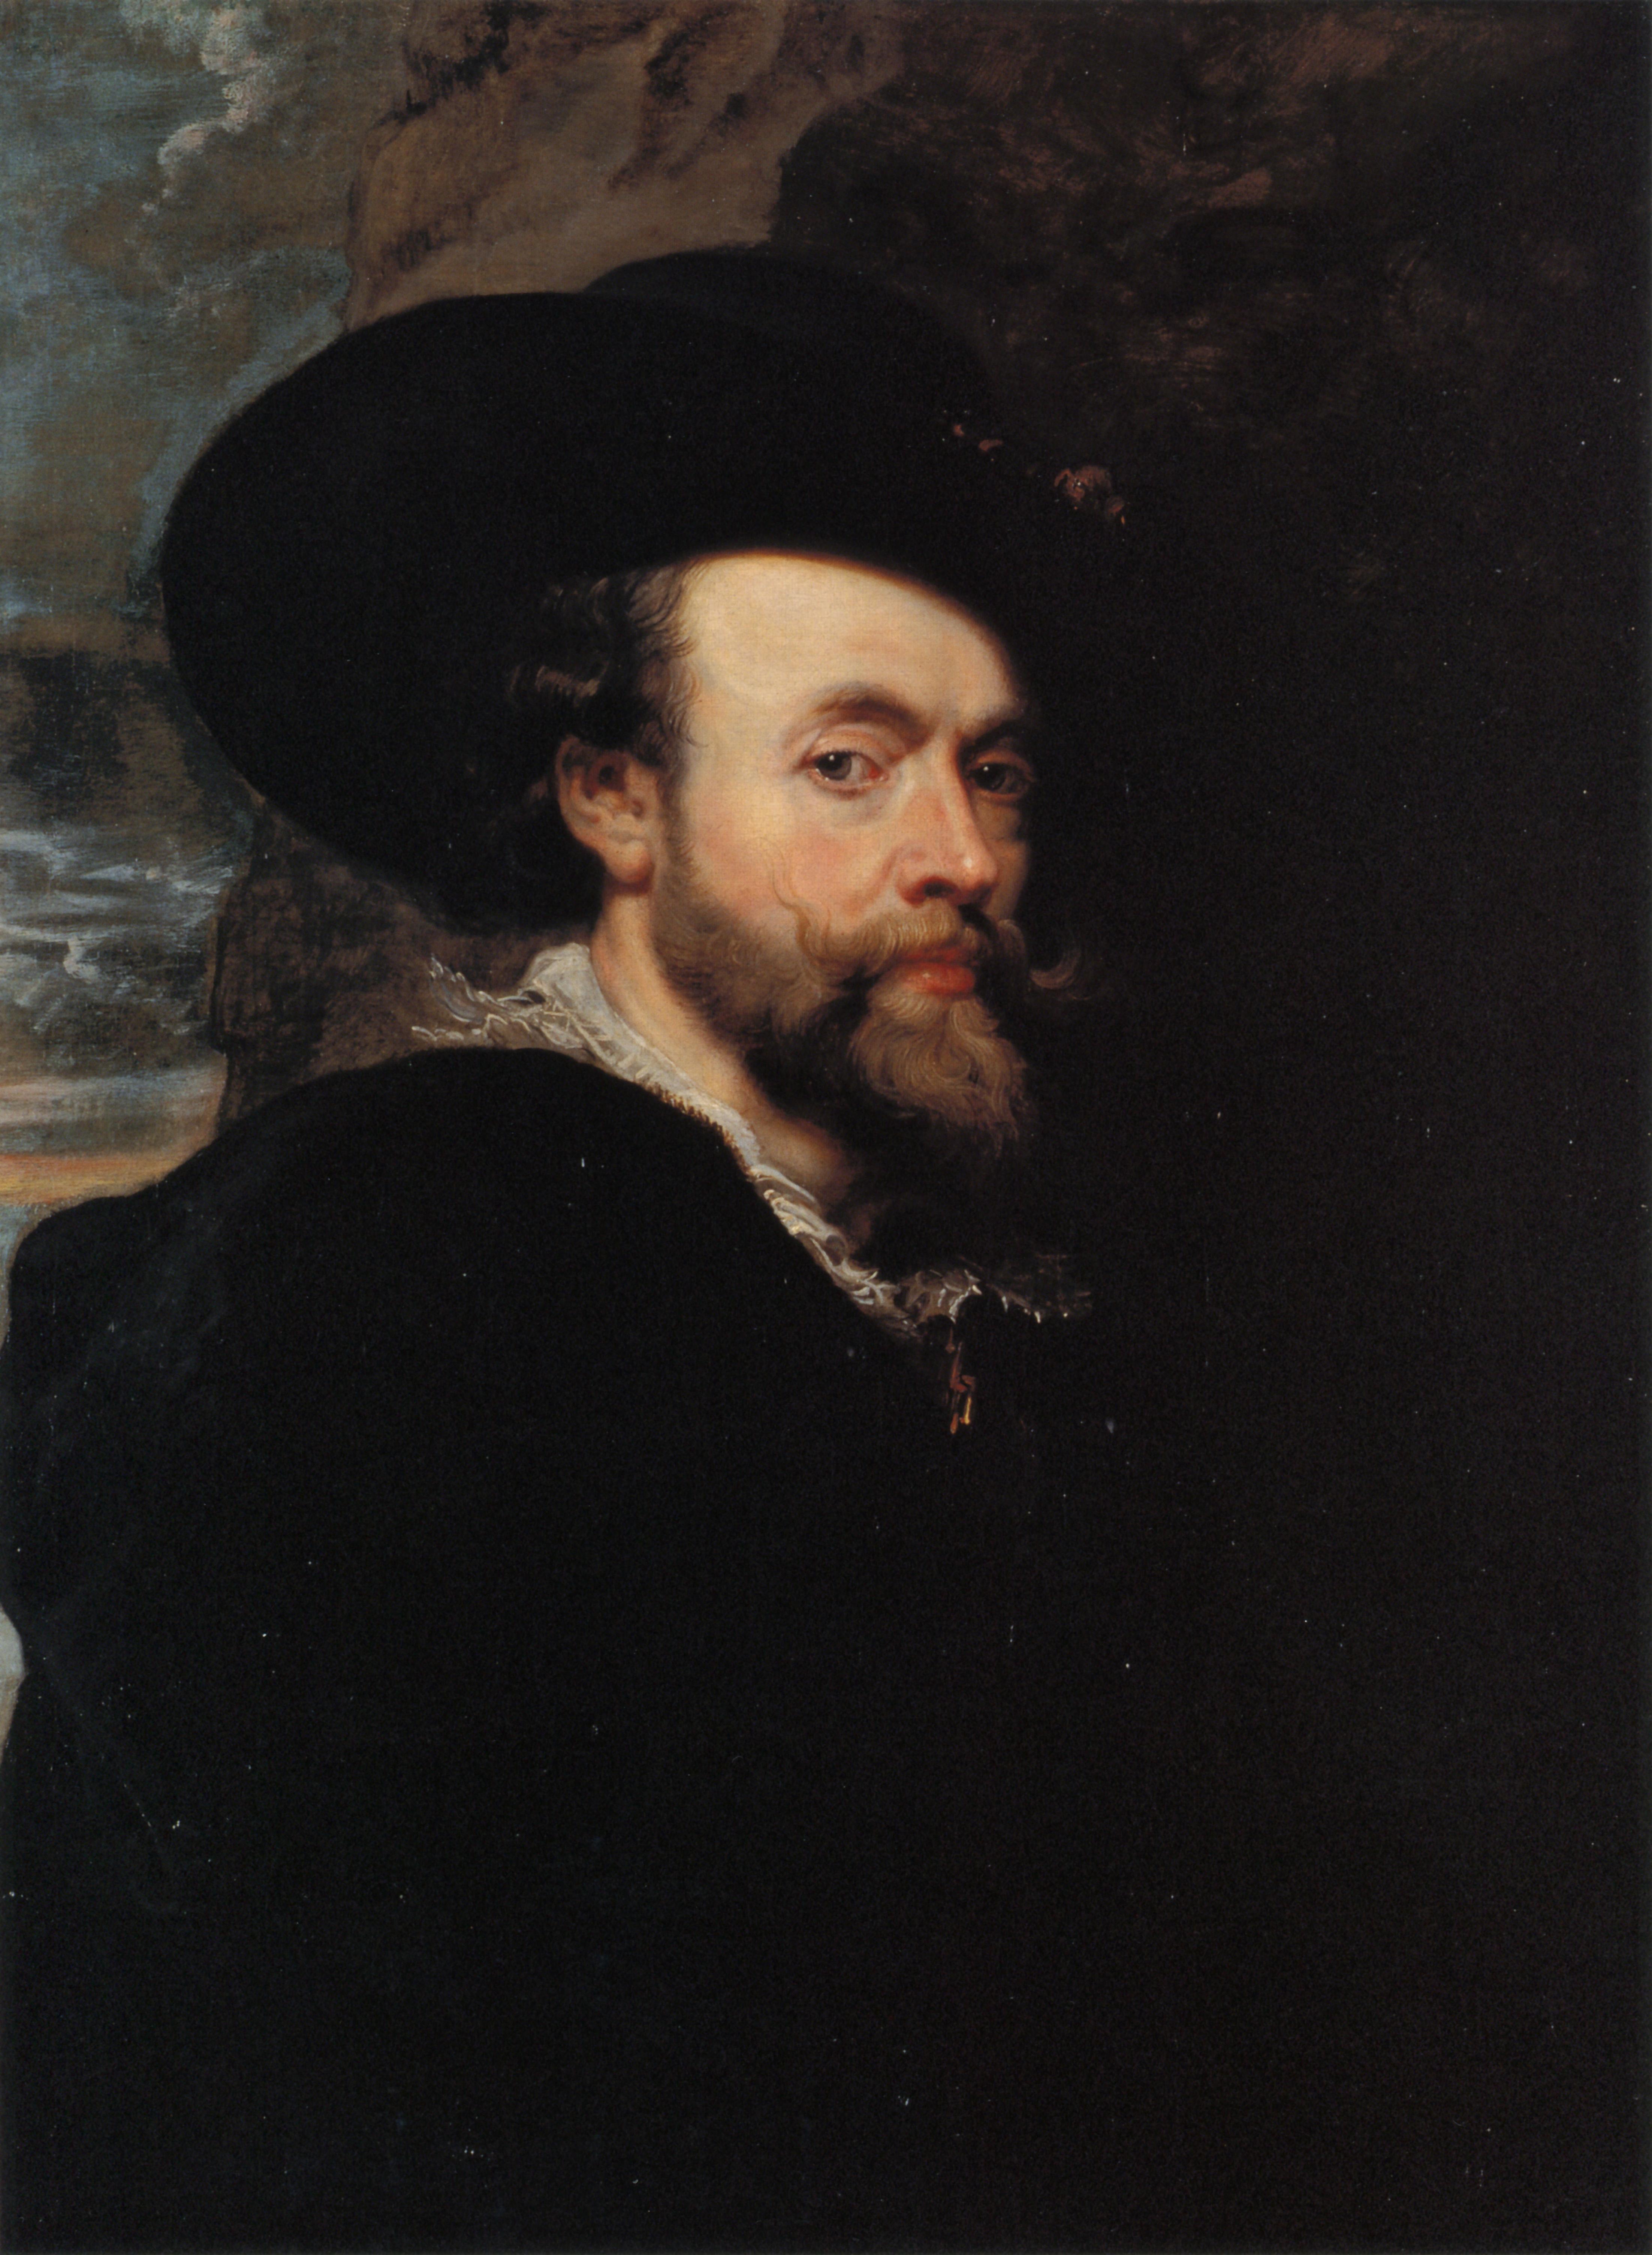 peter paul rubens Artists: peter paul rubens(1577-1640), family of jan brueghel the elder, 1613 –  1615, the samuel  rubens and brueghel jointly produced many paintings.